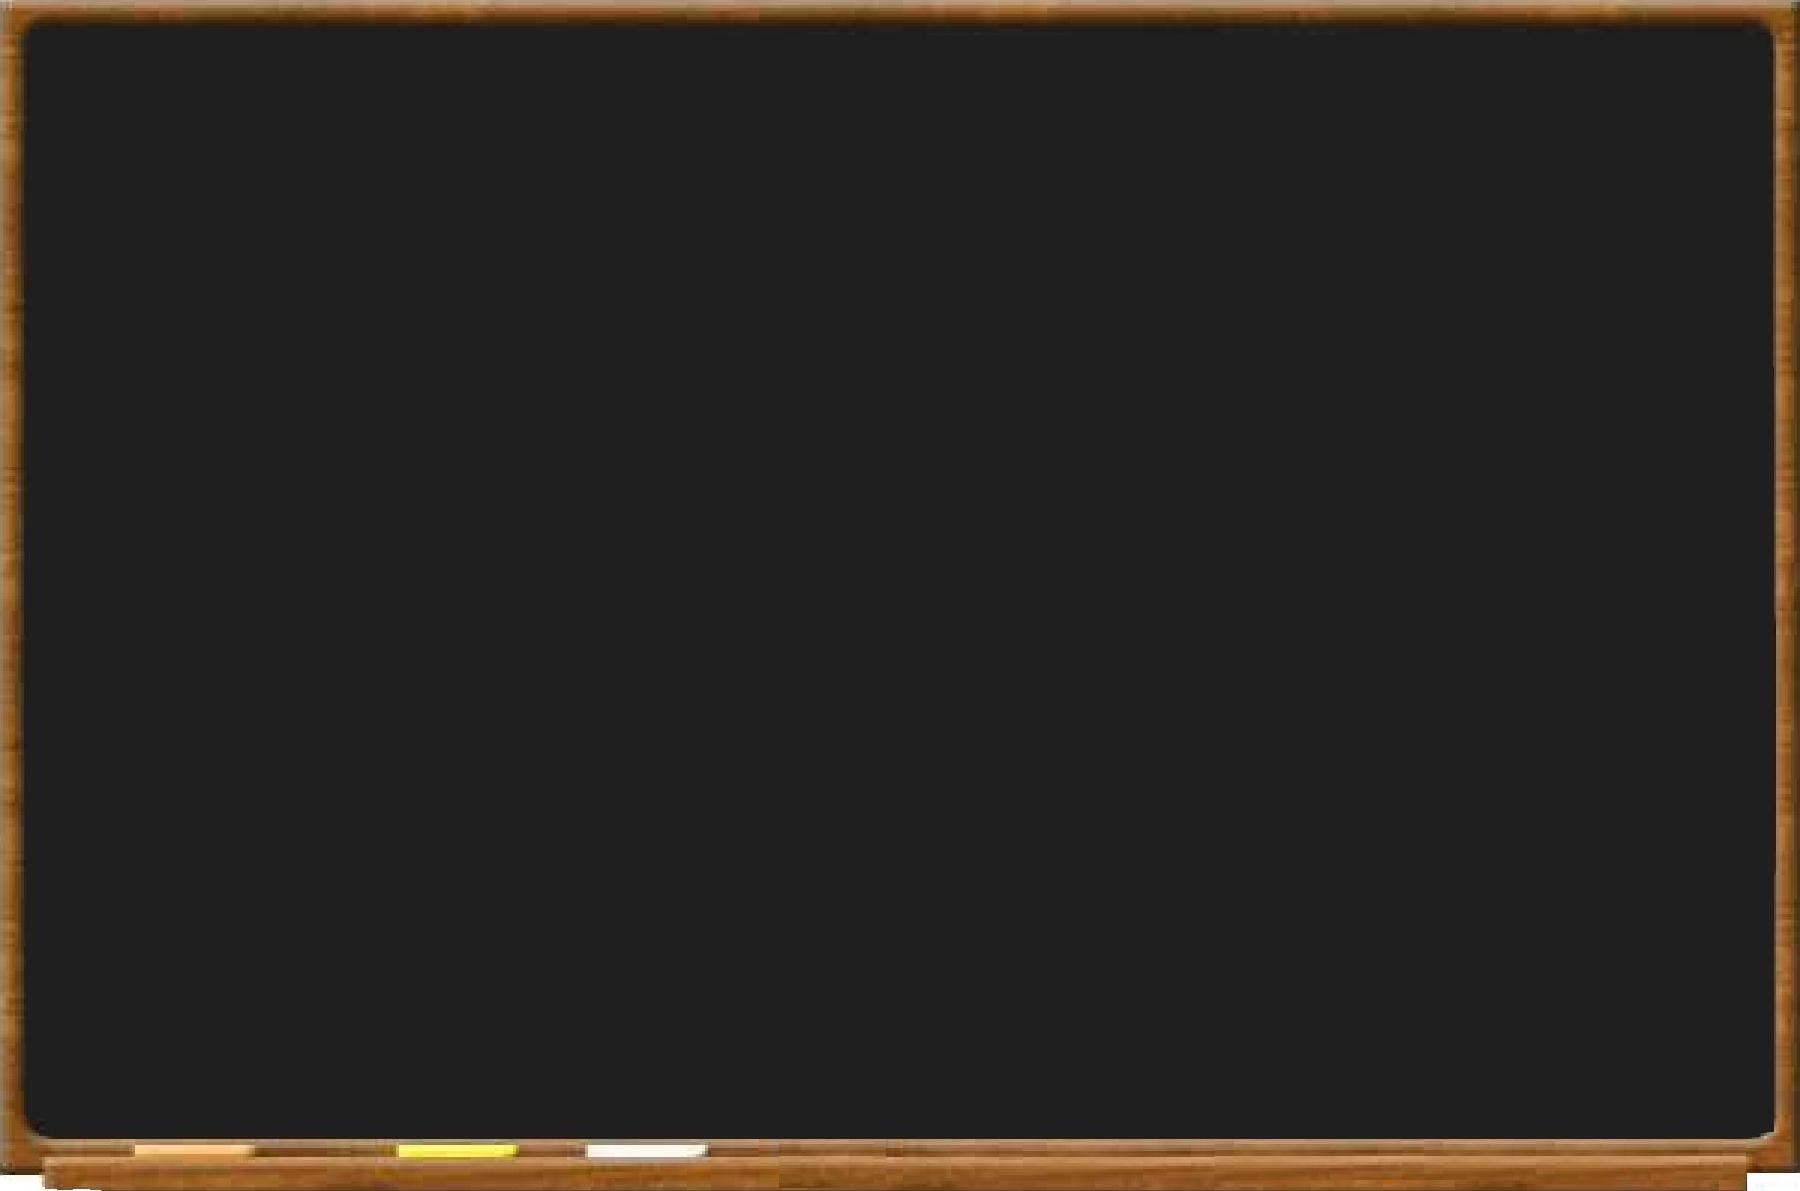 Blackboard clipart modern. Powerpoint art templates quantumgaming